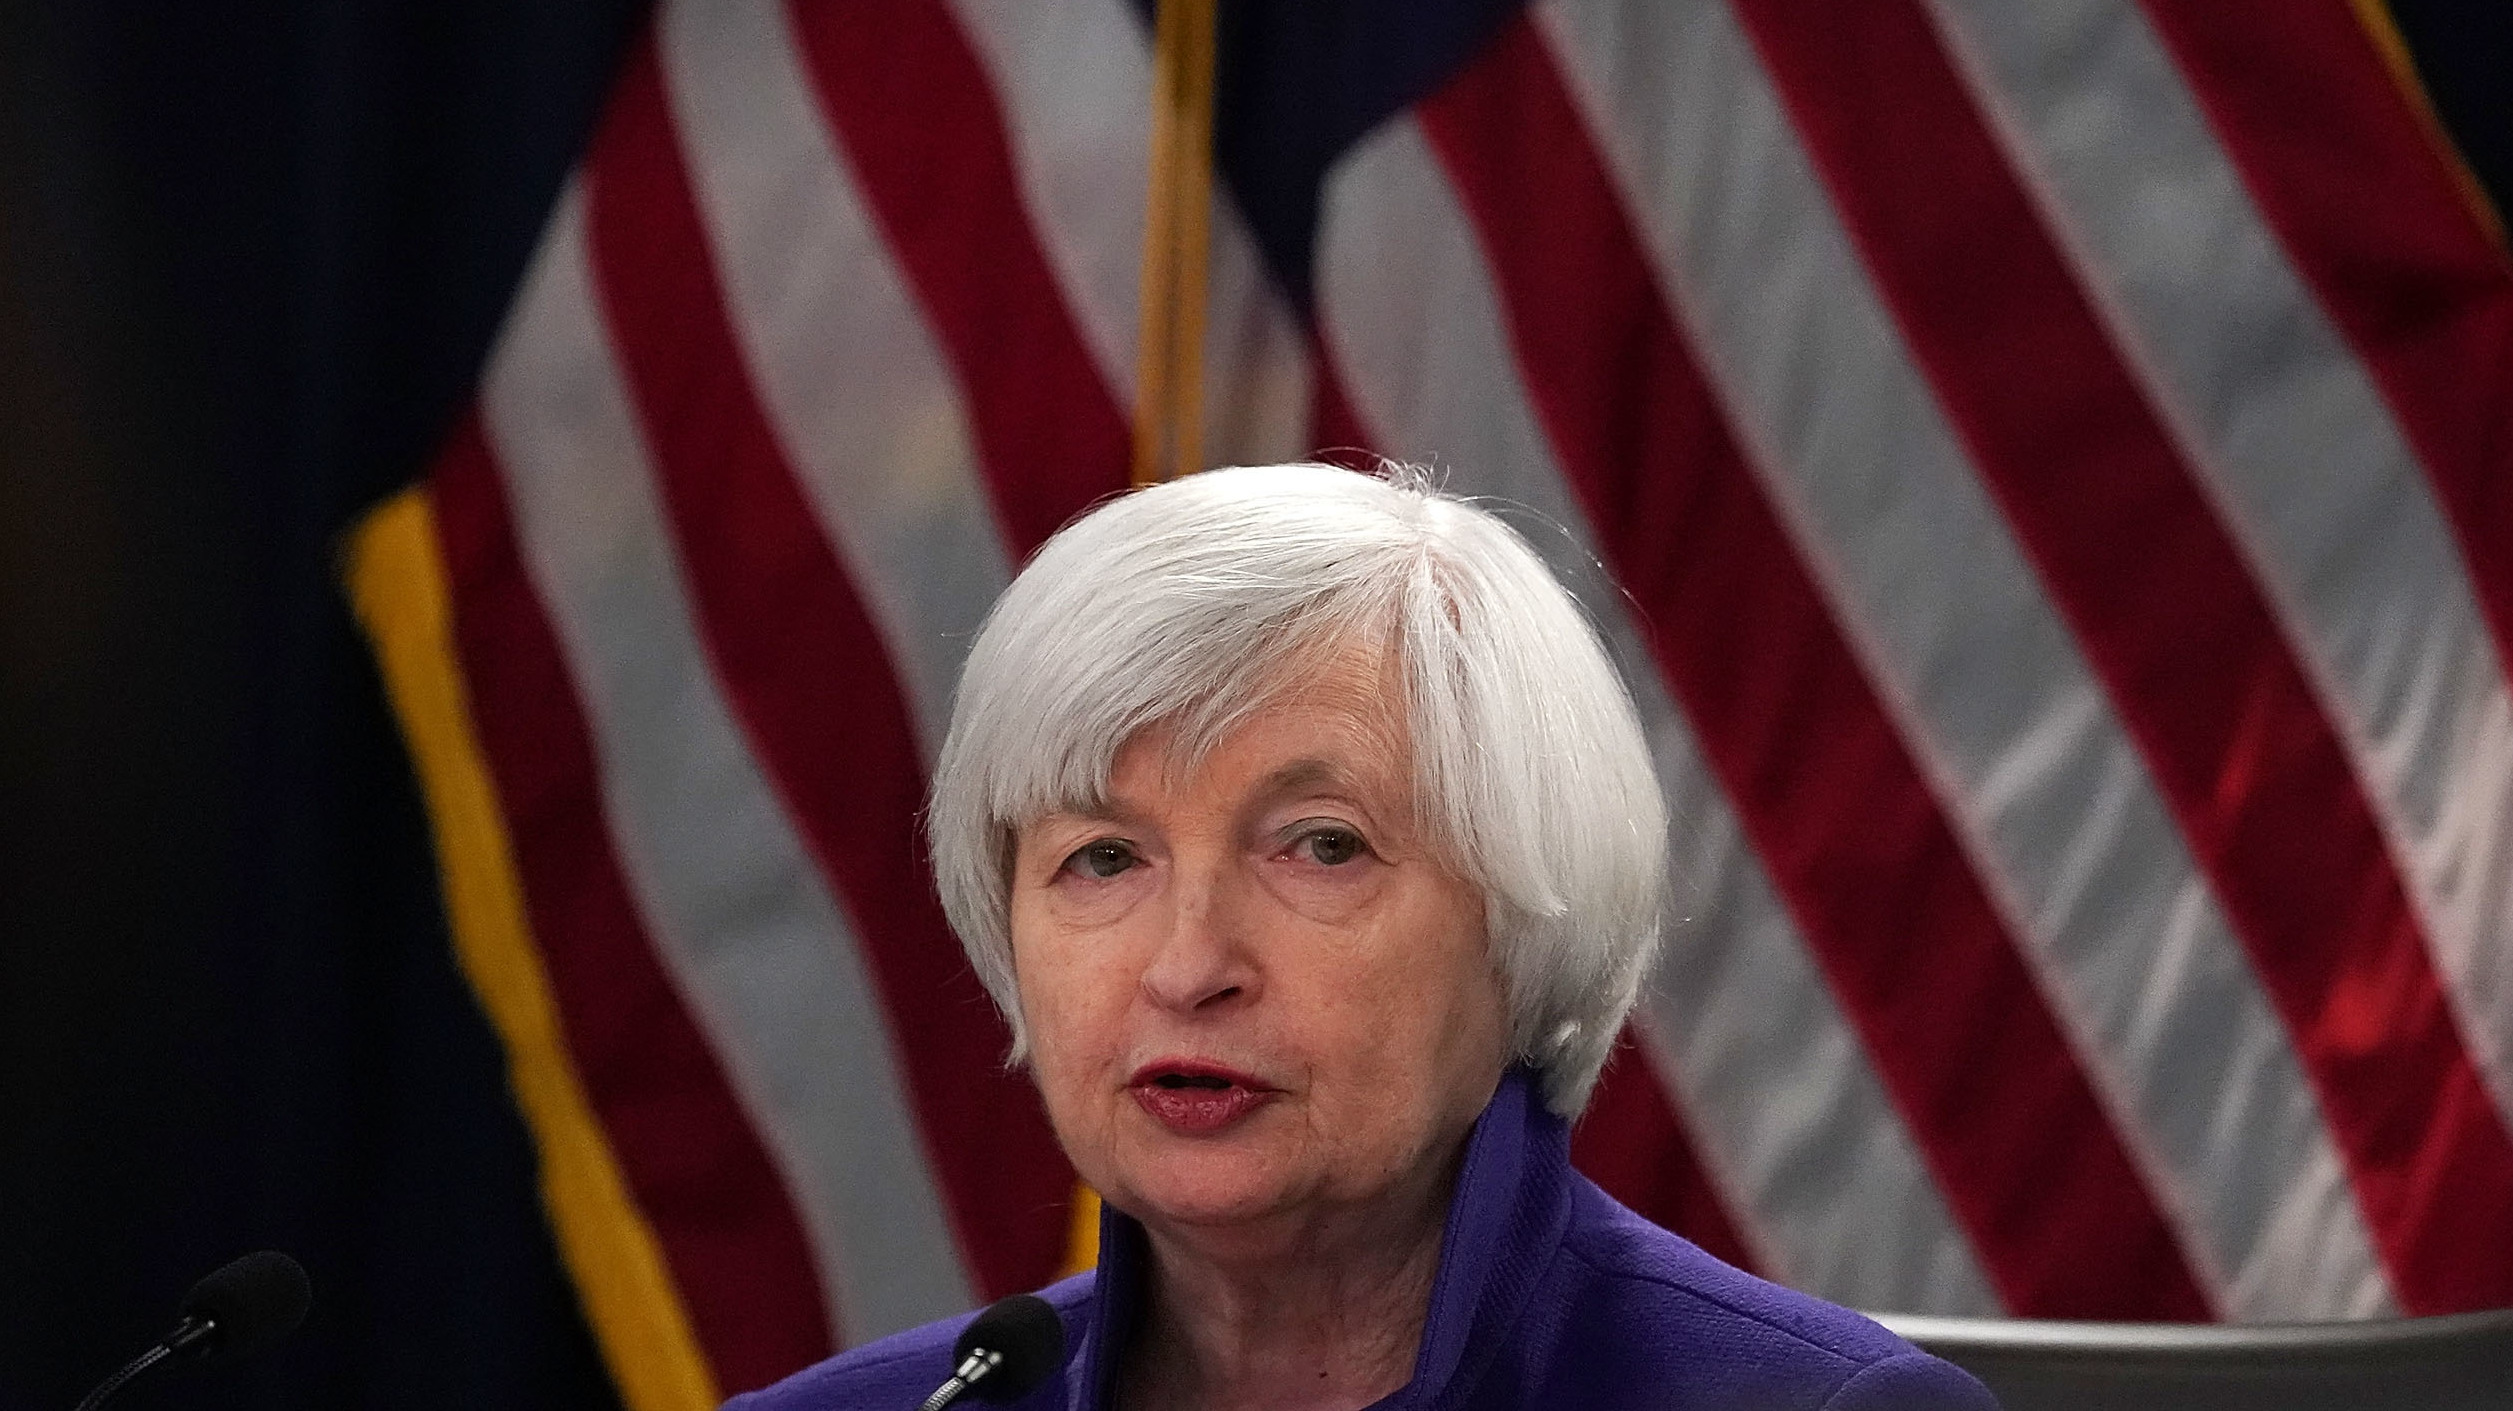 kunm.org - Brakkton Booker - As Virus Rages And U.S. Economy Sputters, Biden To Formally Unveil Economic Team